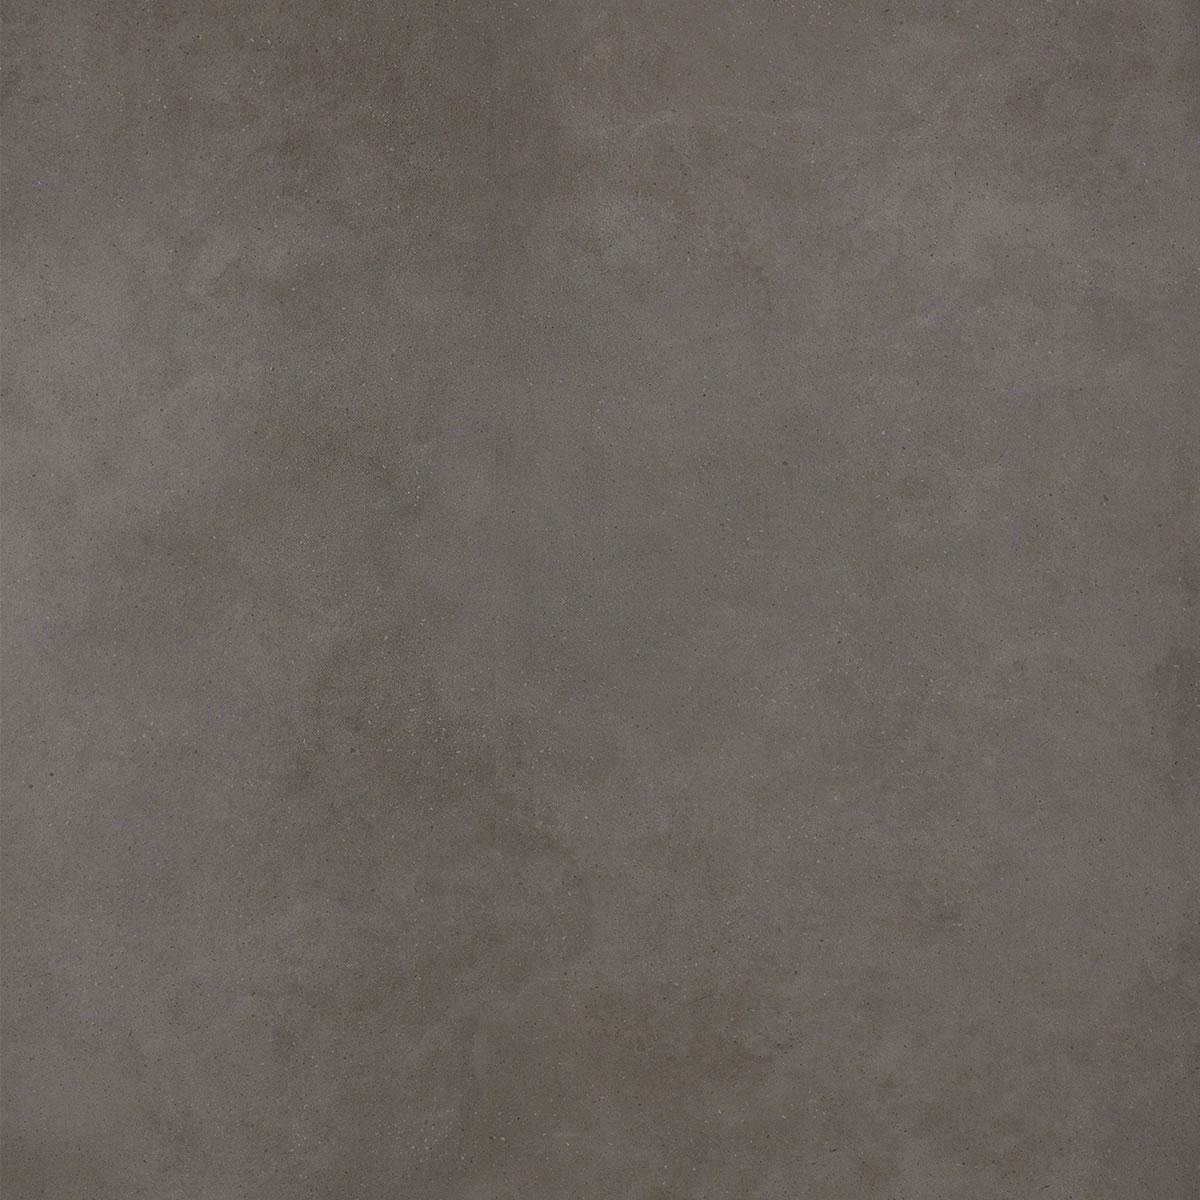 Polished concrete effect tiles minoli dreamwell smoke tiles dailygadgetfo Image collections